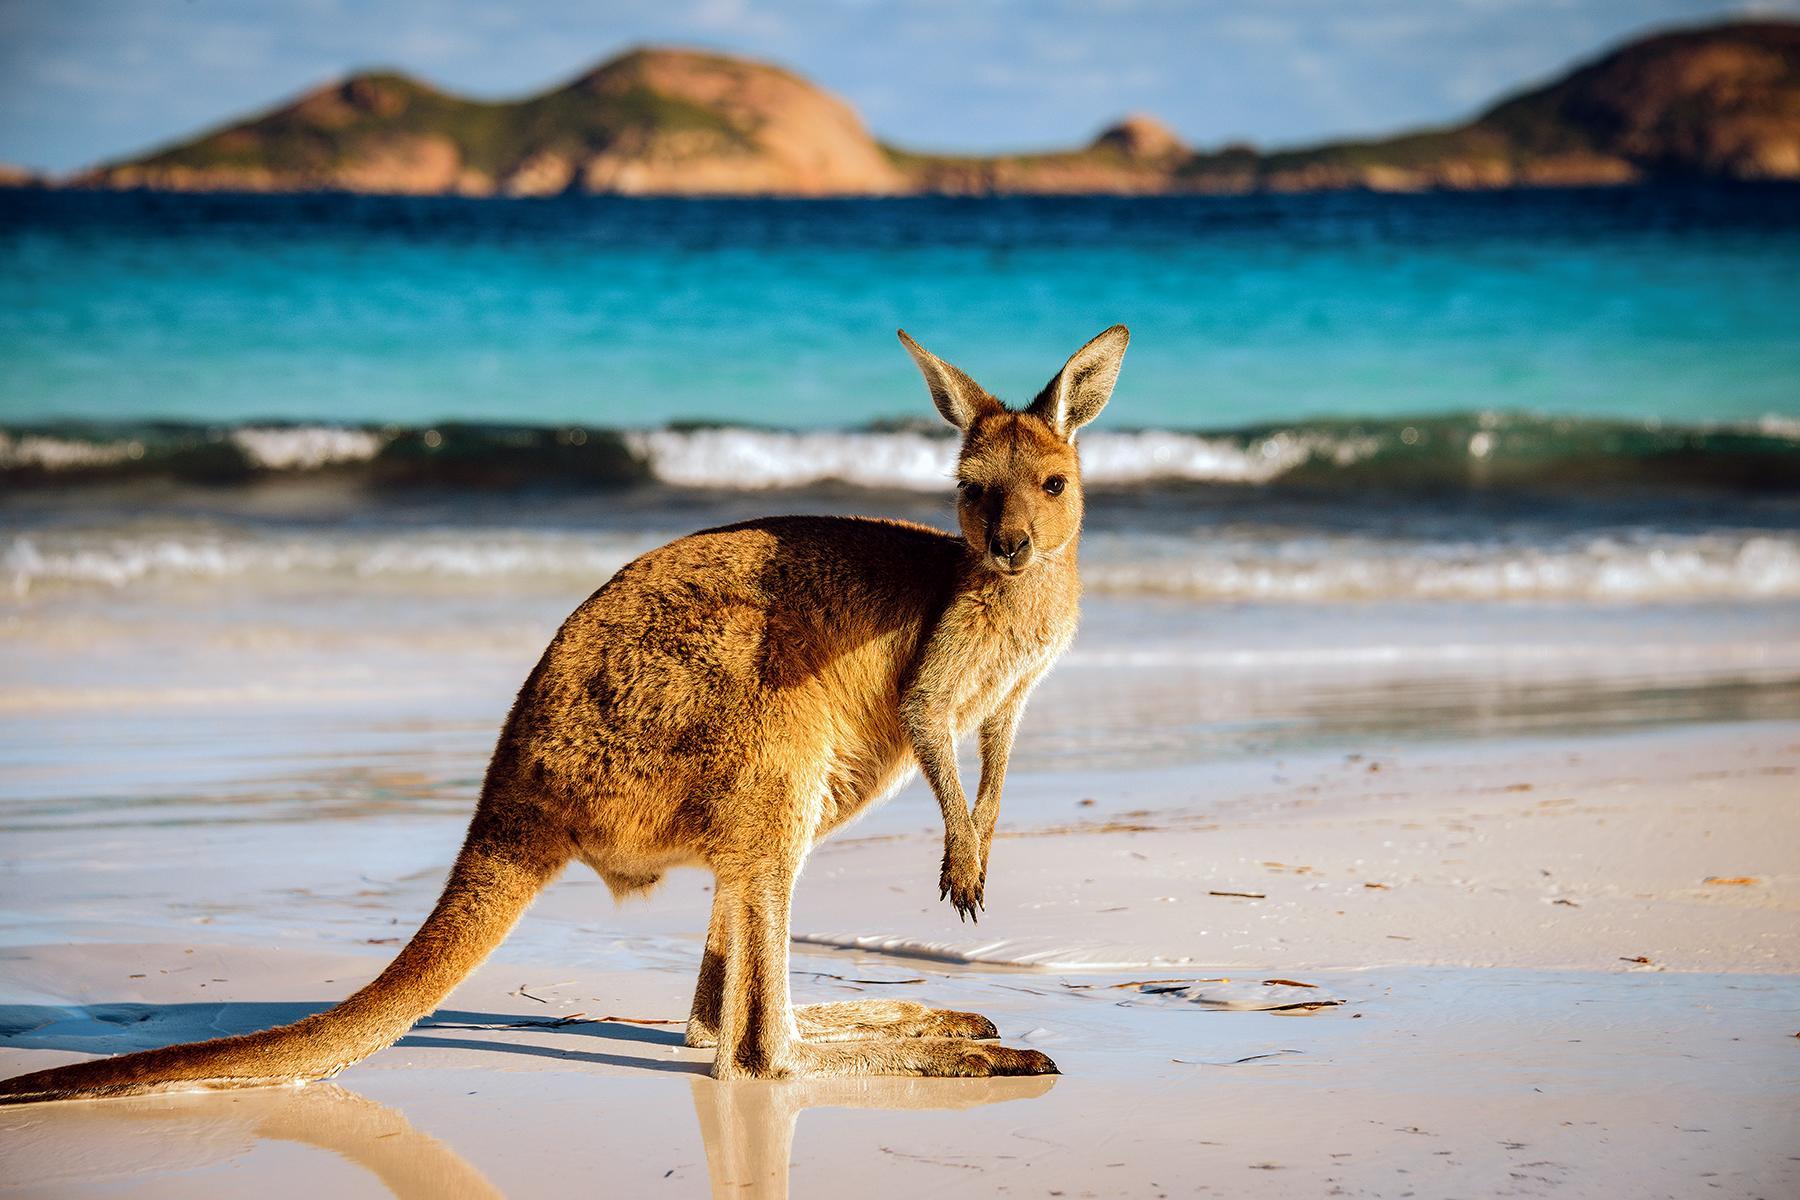 15_Australia_WTK_Vaccinations_shutterstock_603577658